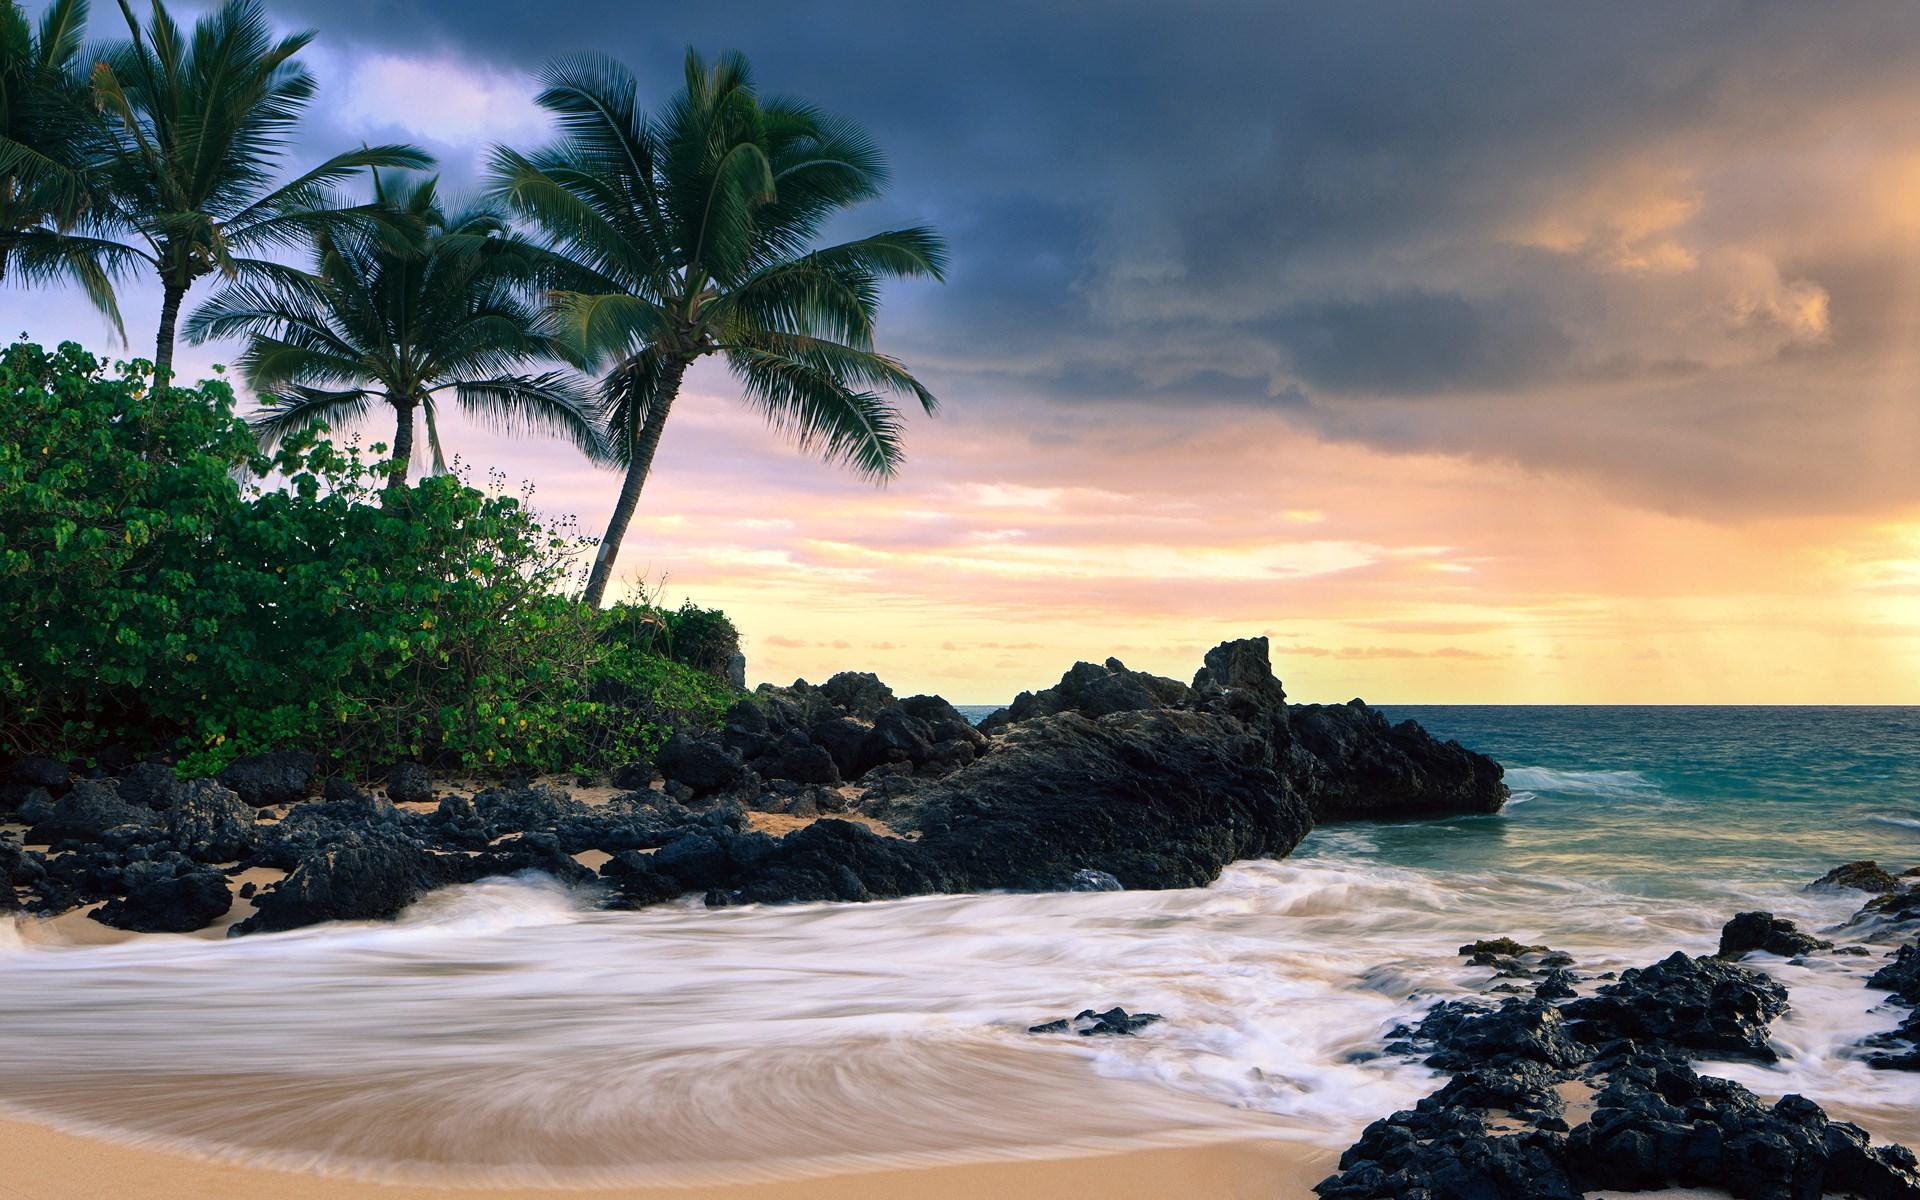 Molokai Shore, Hawaii скачать